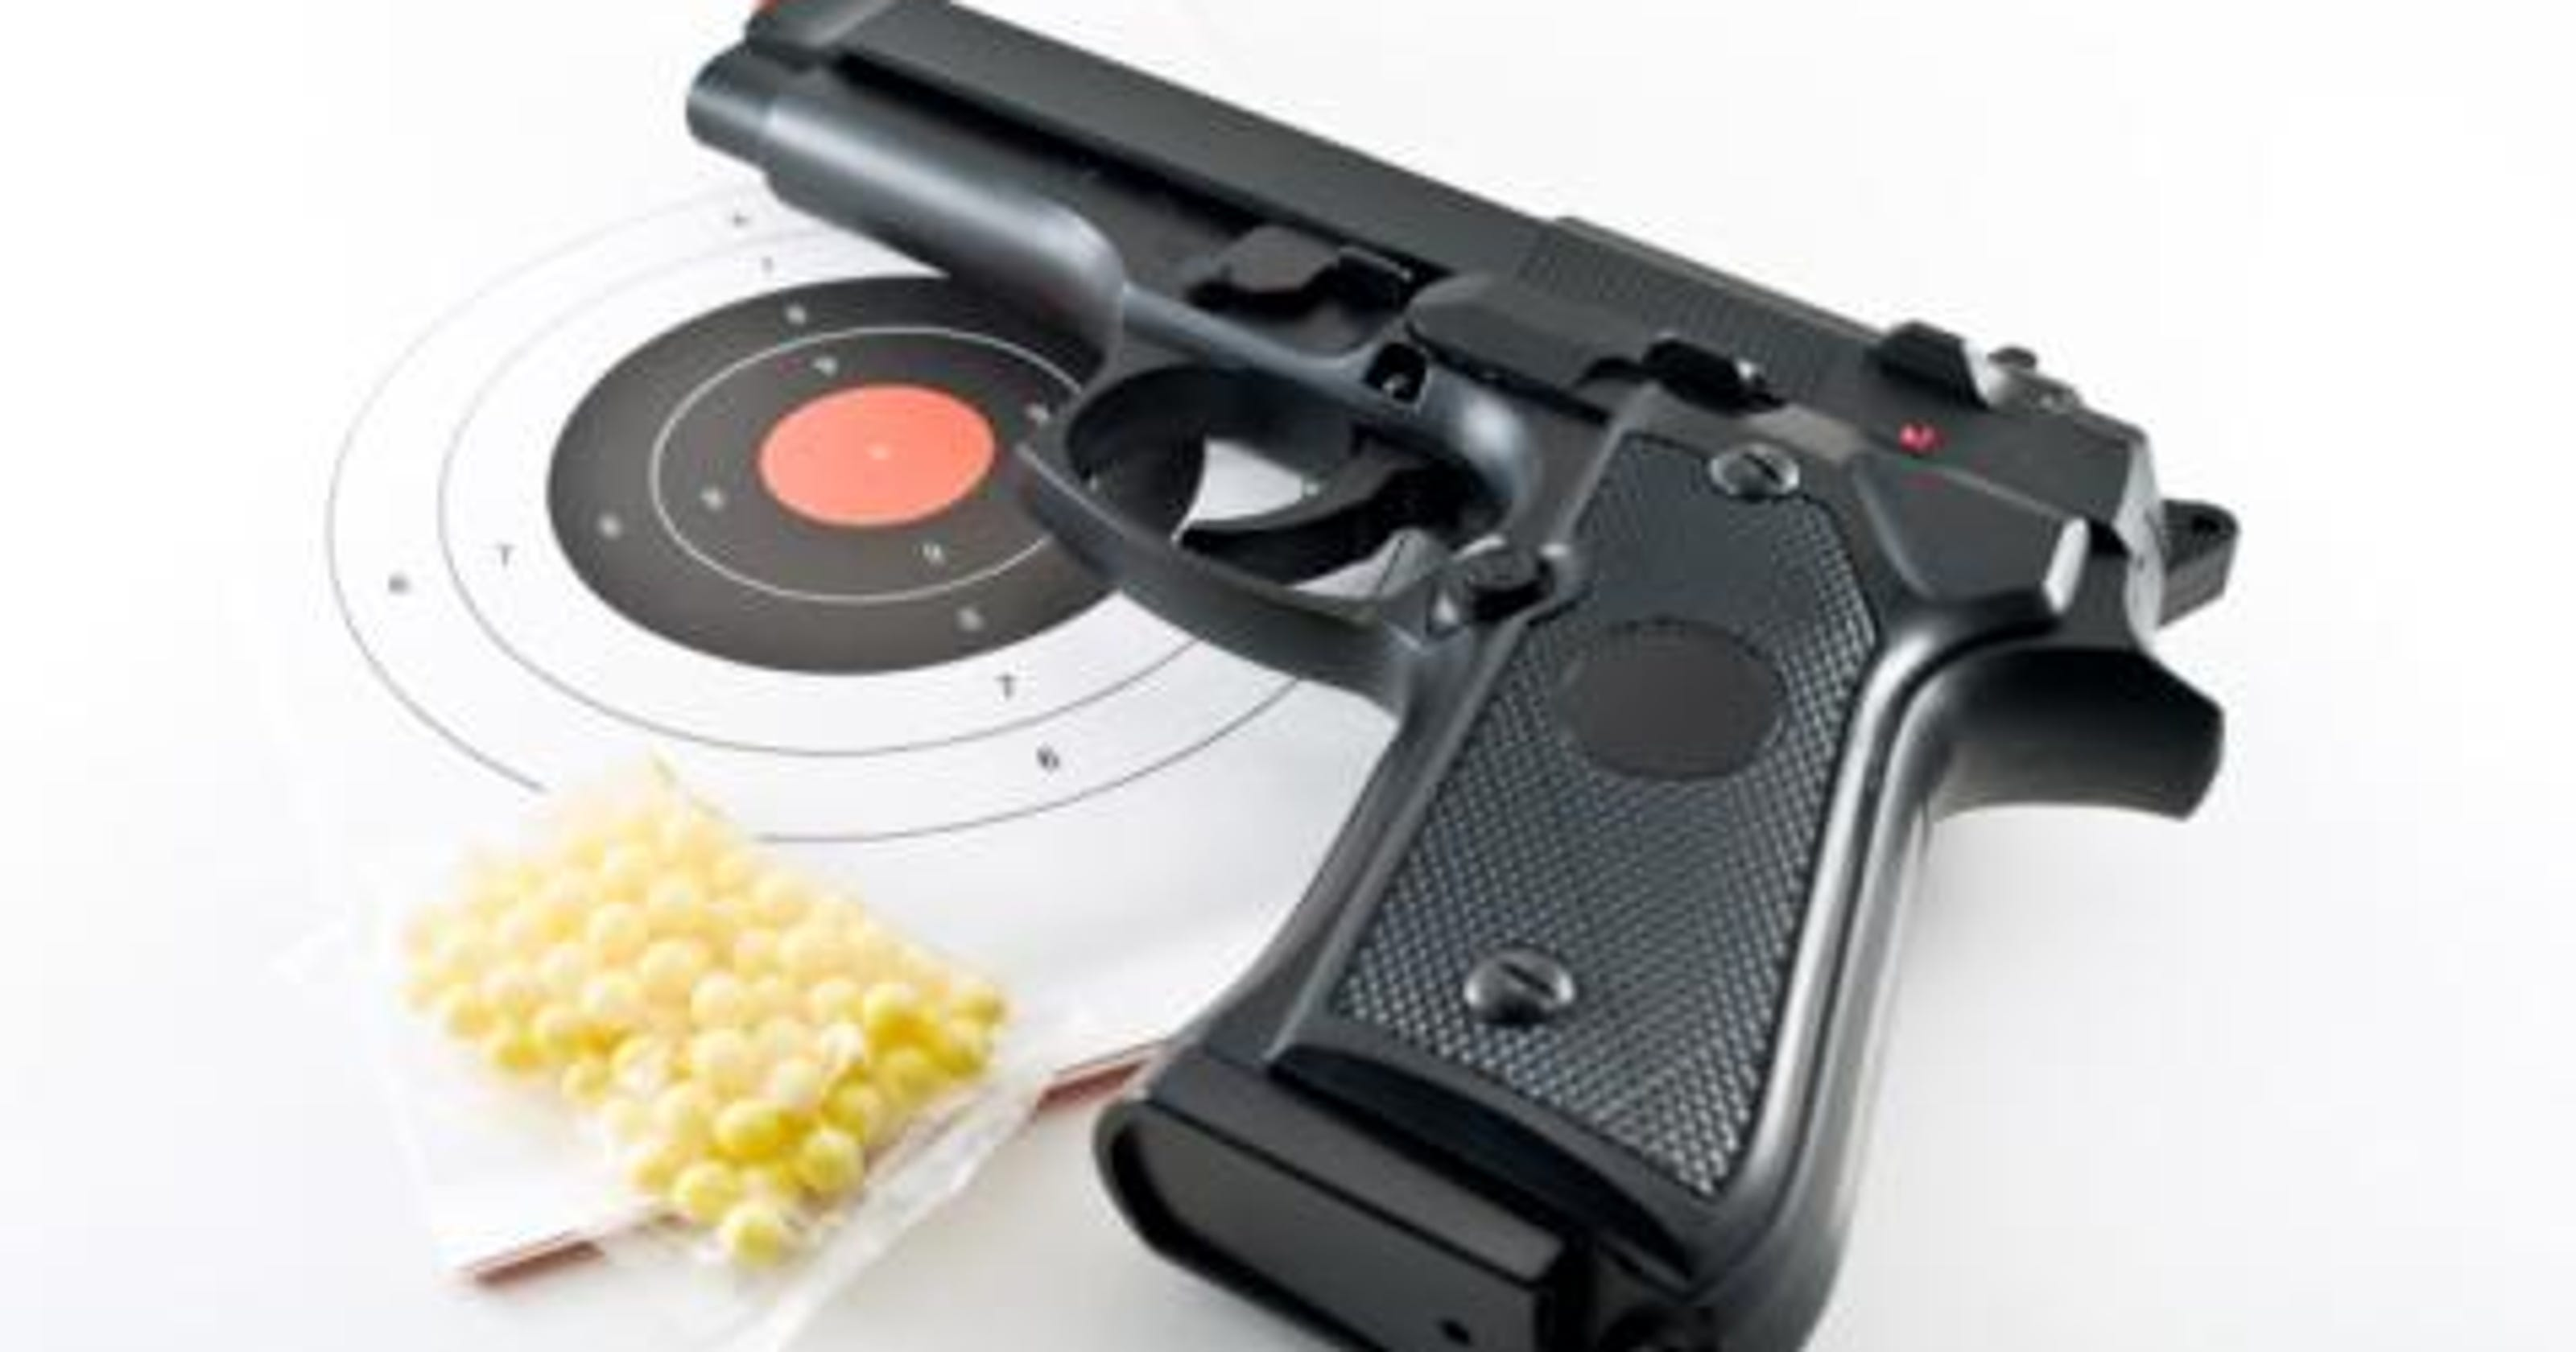 Sioux City might ban BB, pellet guns